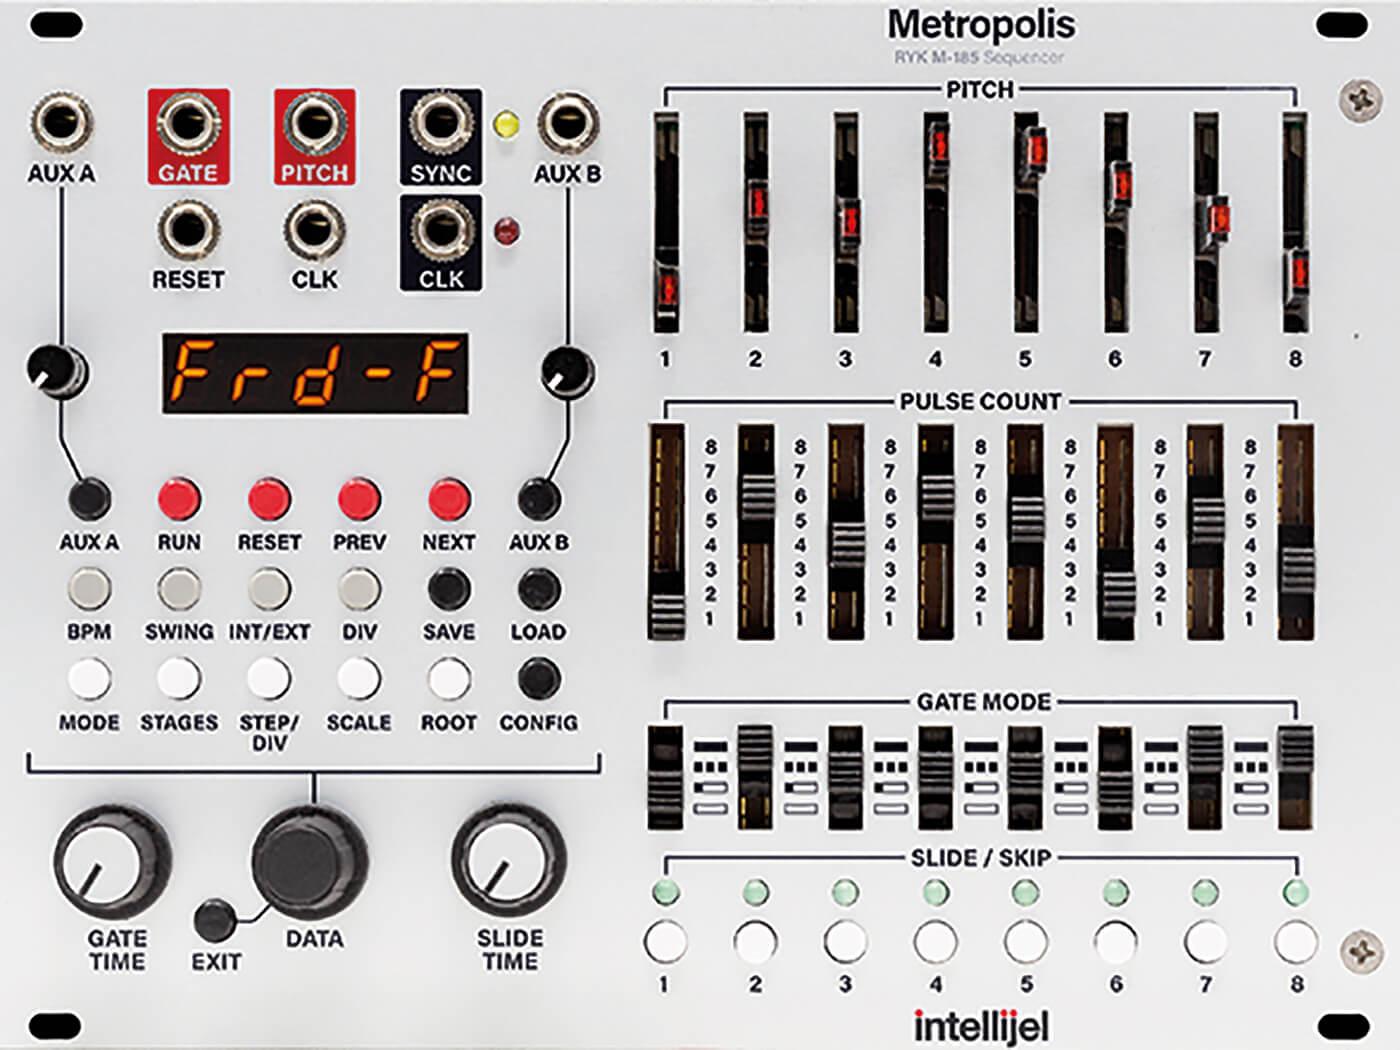 Intellijel Metropolis